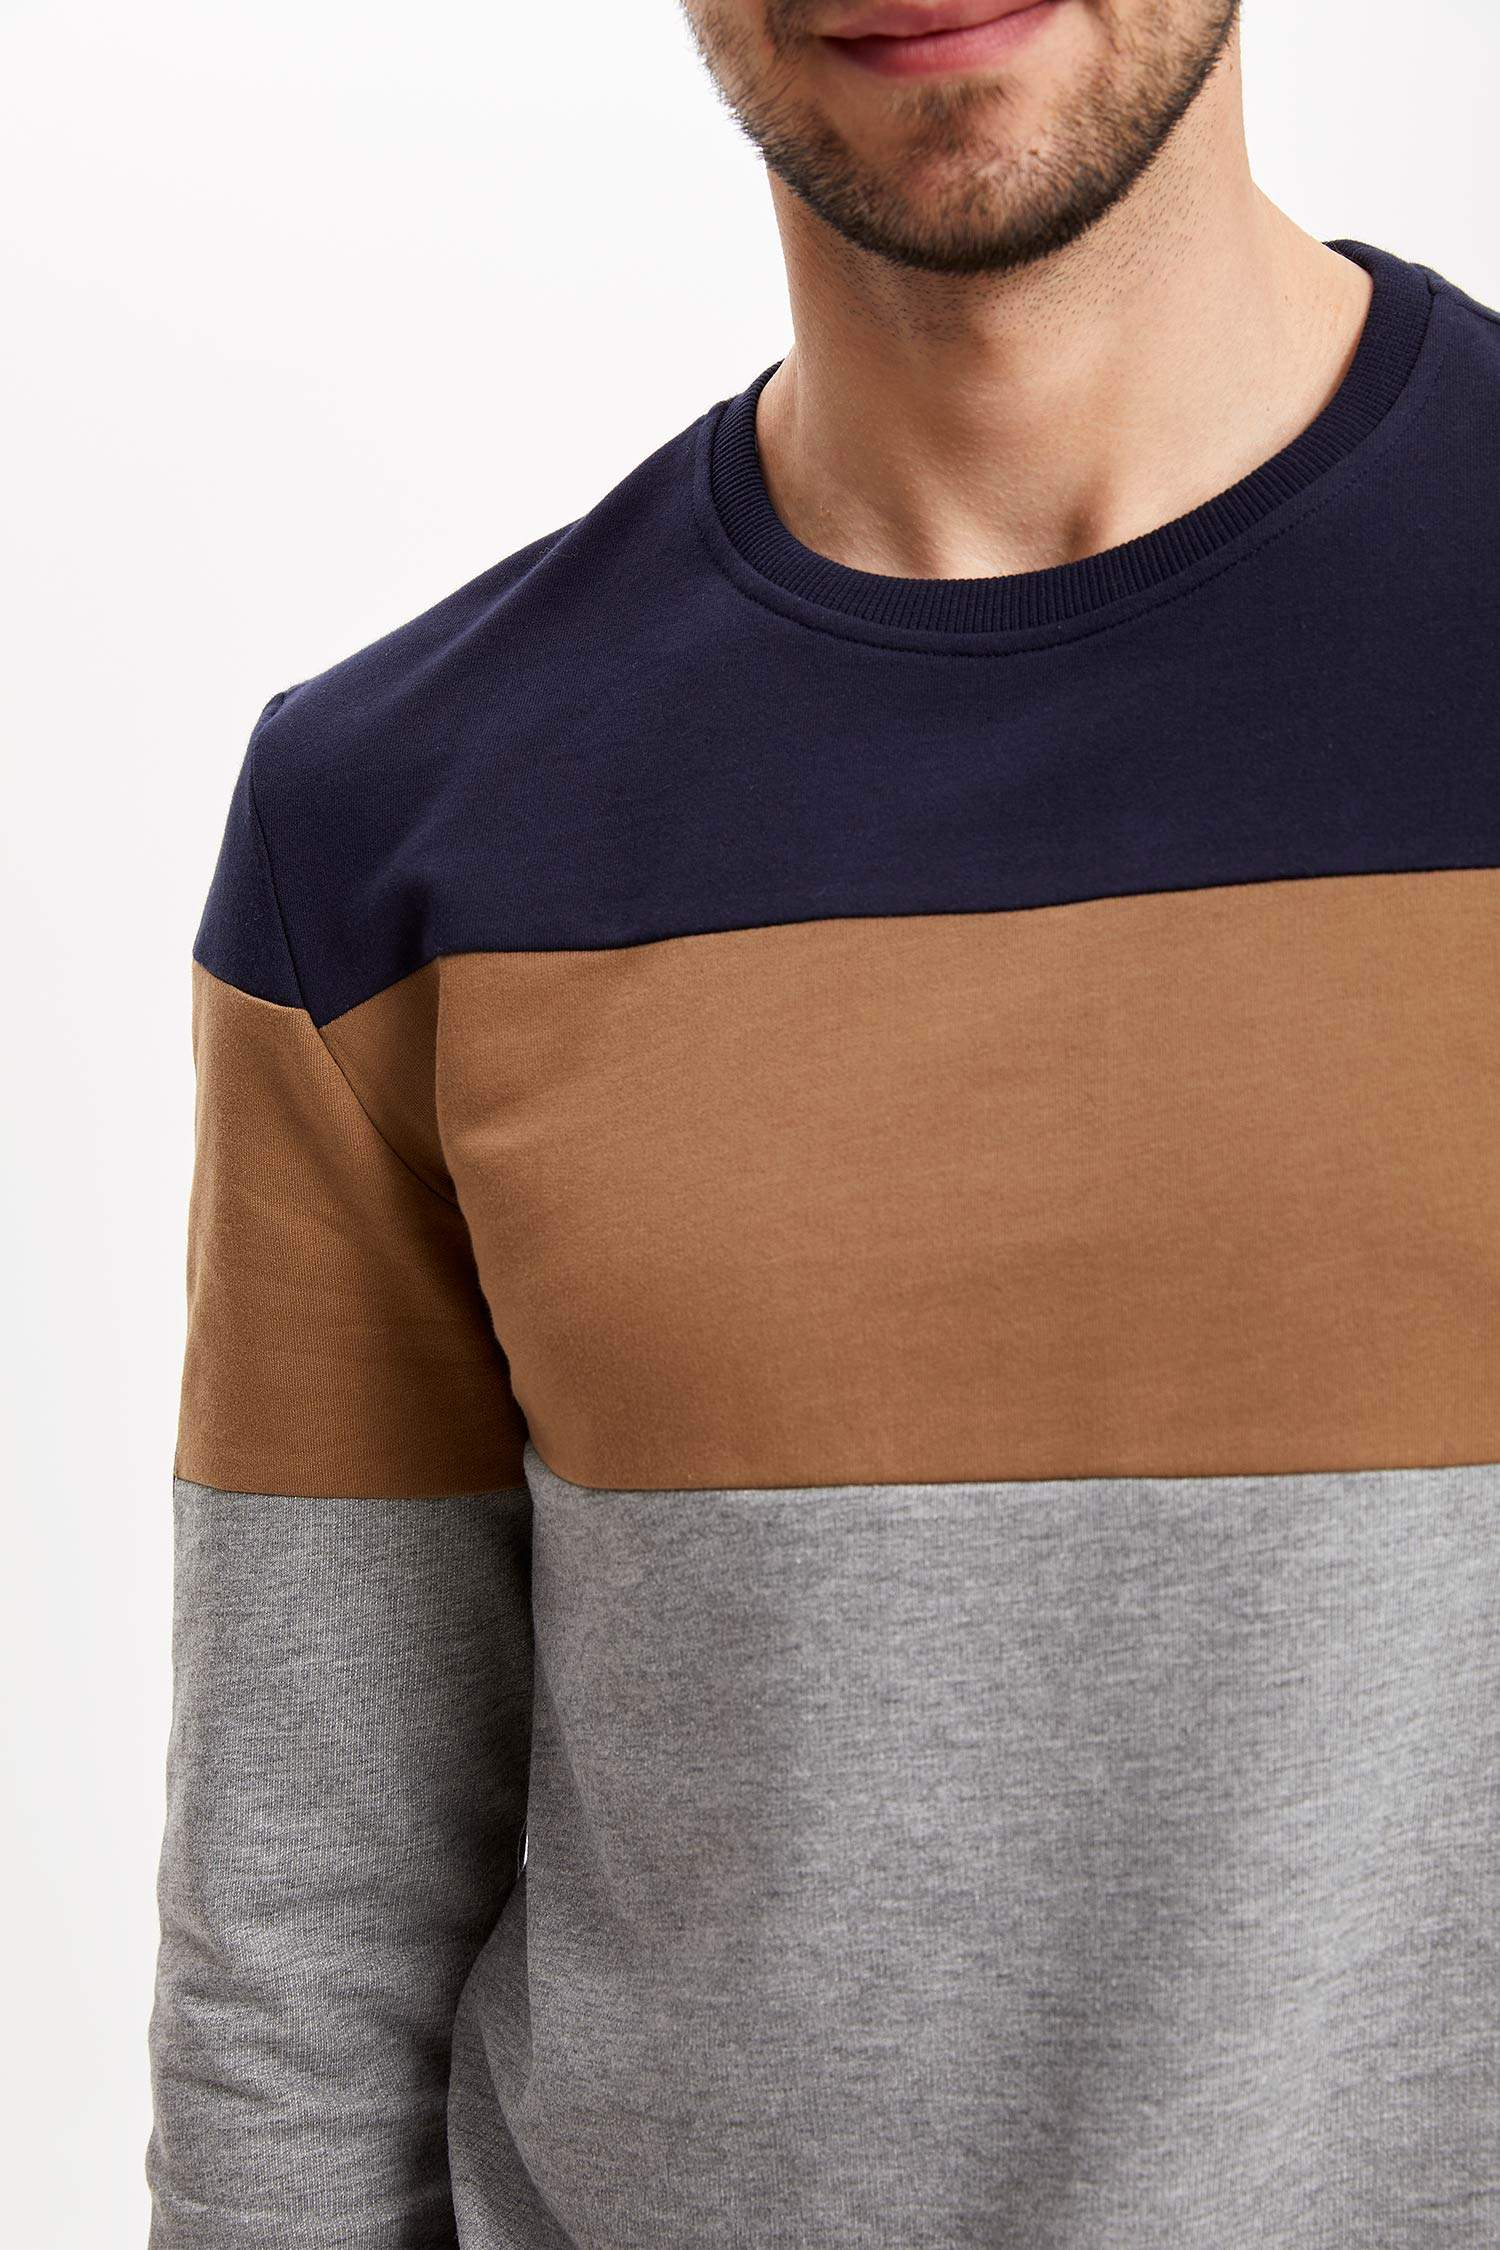 60f0083396ebb Lacivert Erkek Renkli Sweatshirt 962605 | DeFacto